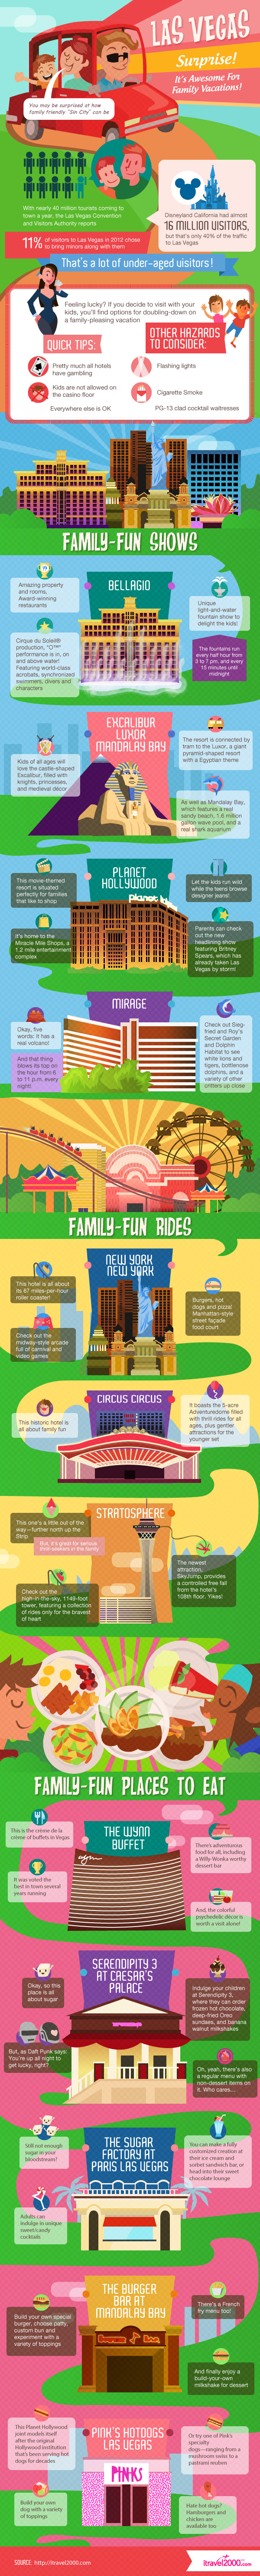 infographic Las Vegas